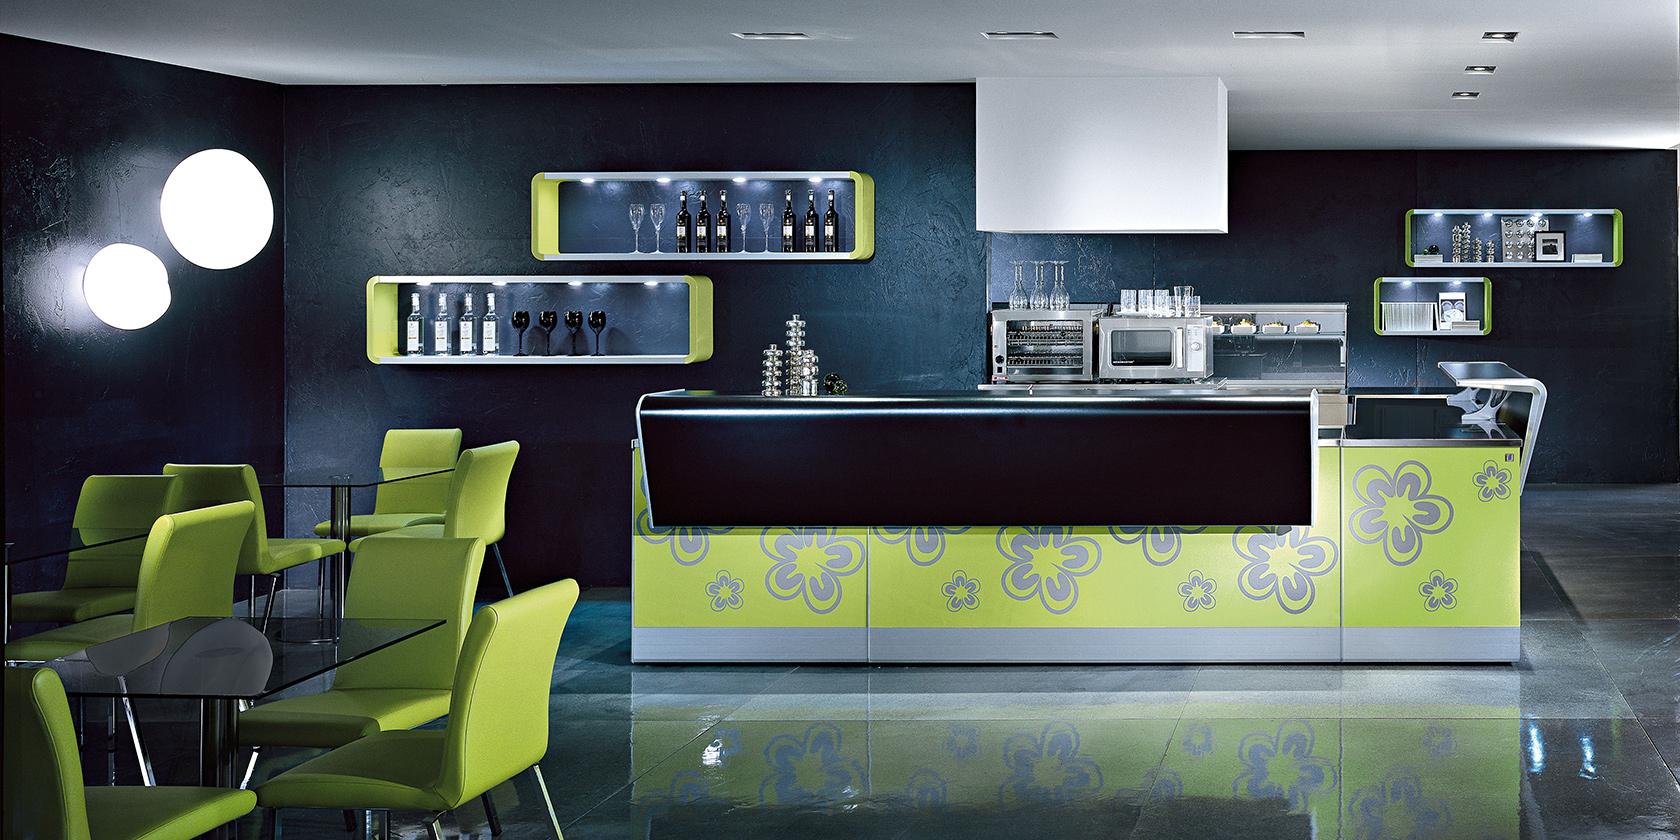 Banco bar beverly dal design moderno e originale dbanchibar for Banco bar moderno